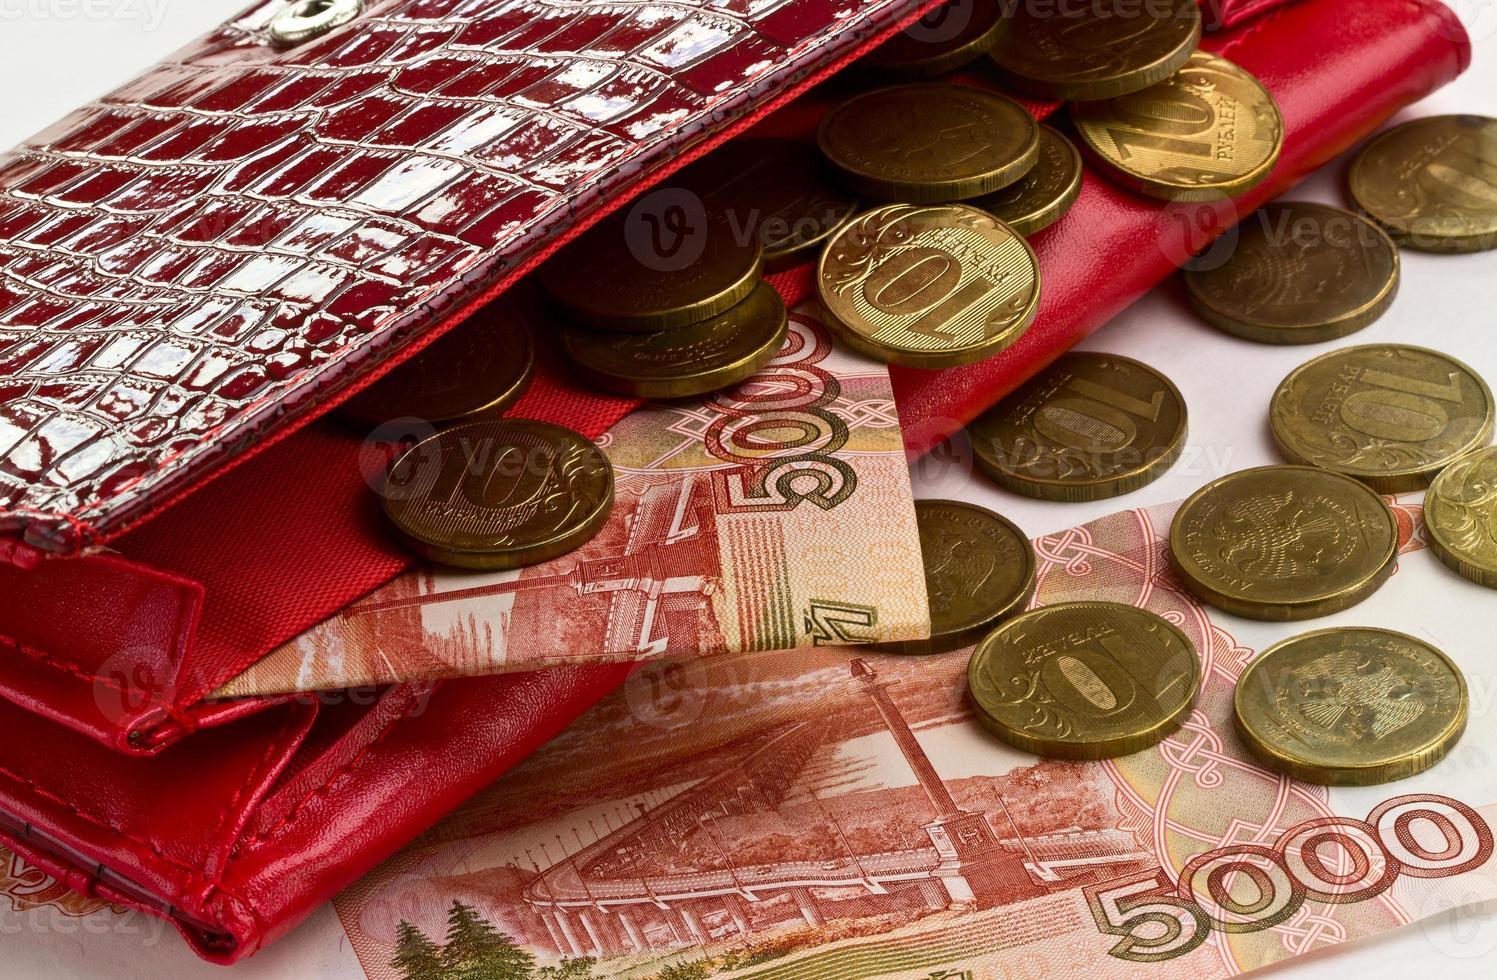 soldi in una borsa rossa foto